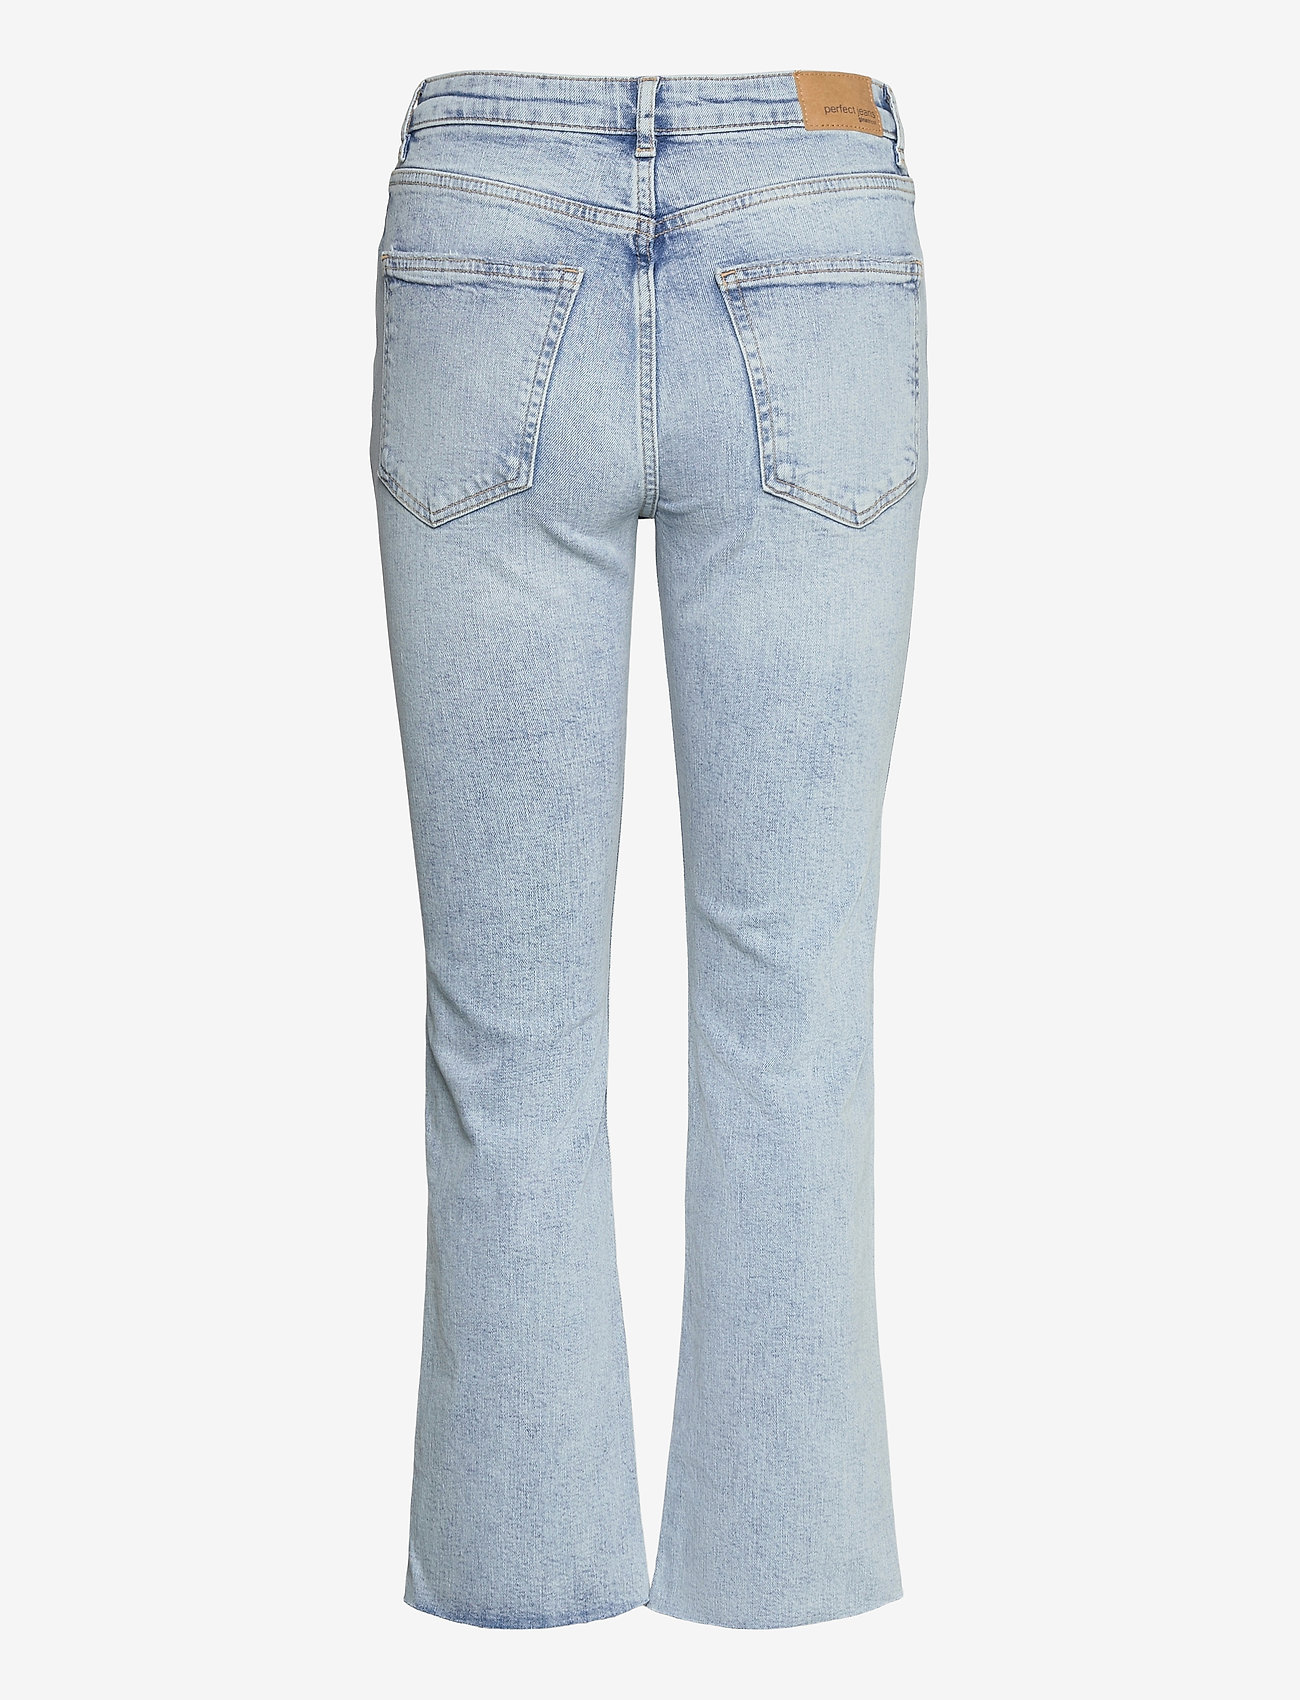 Gina Tricot - Ylva kick flare jeans - schlaghosen - sky blue - 1